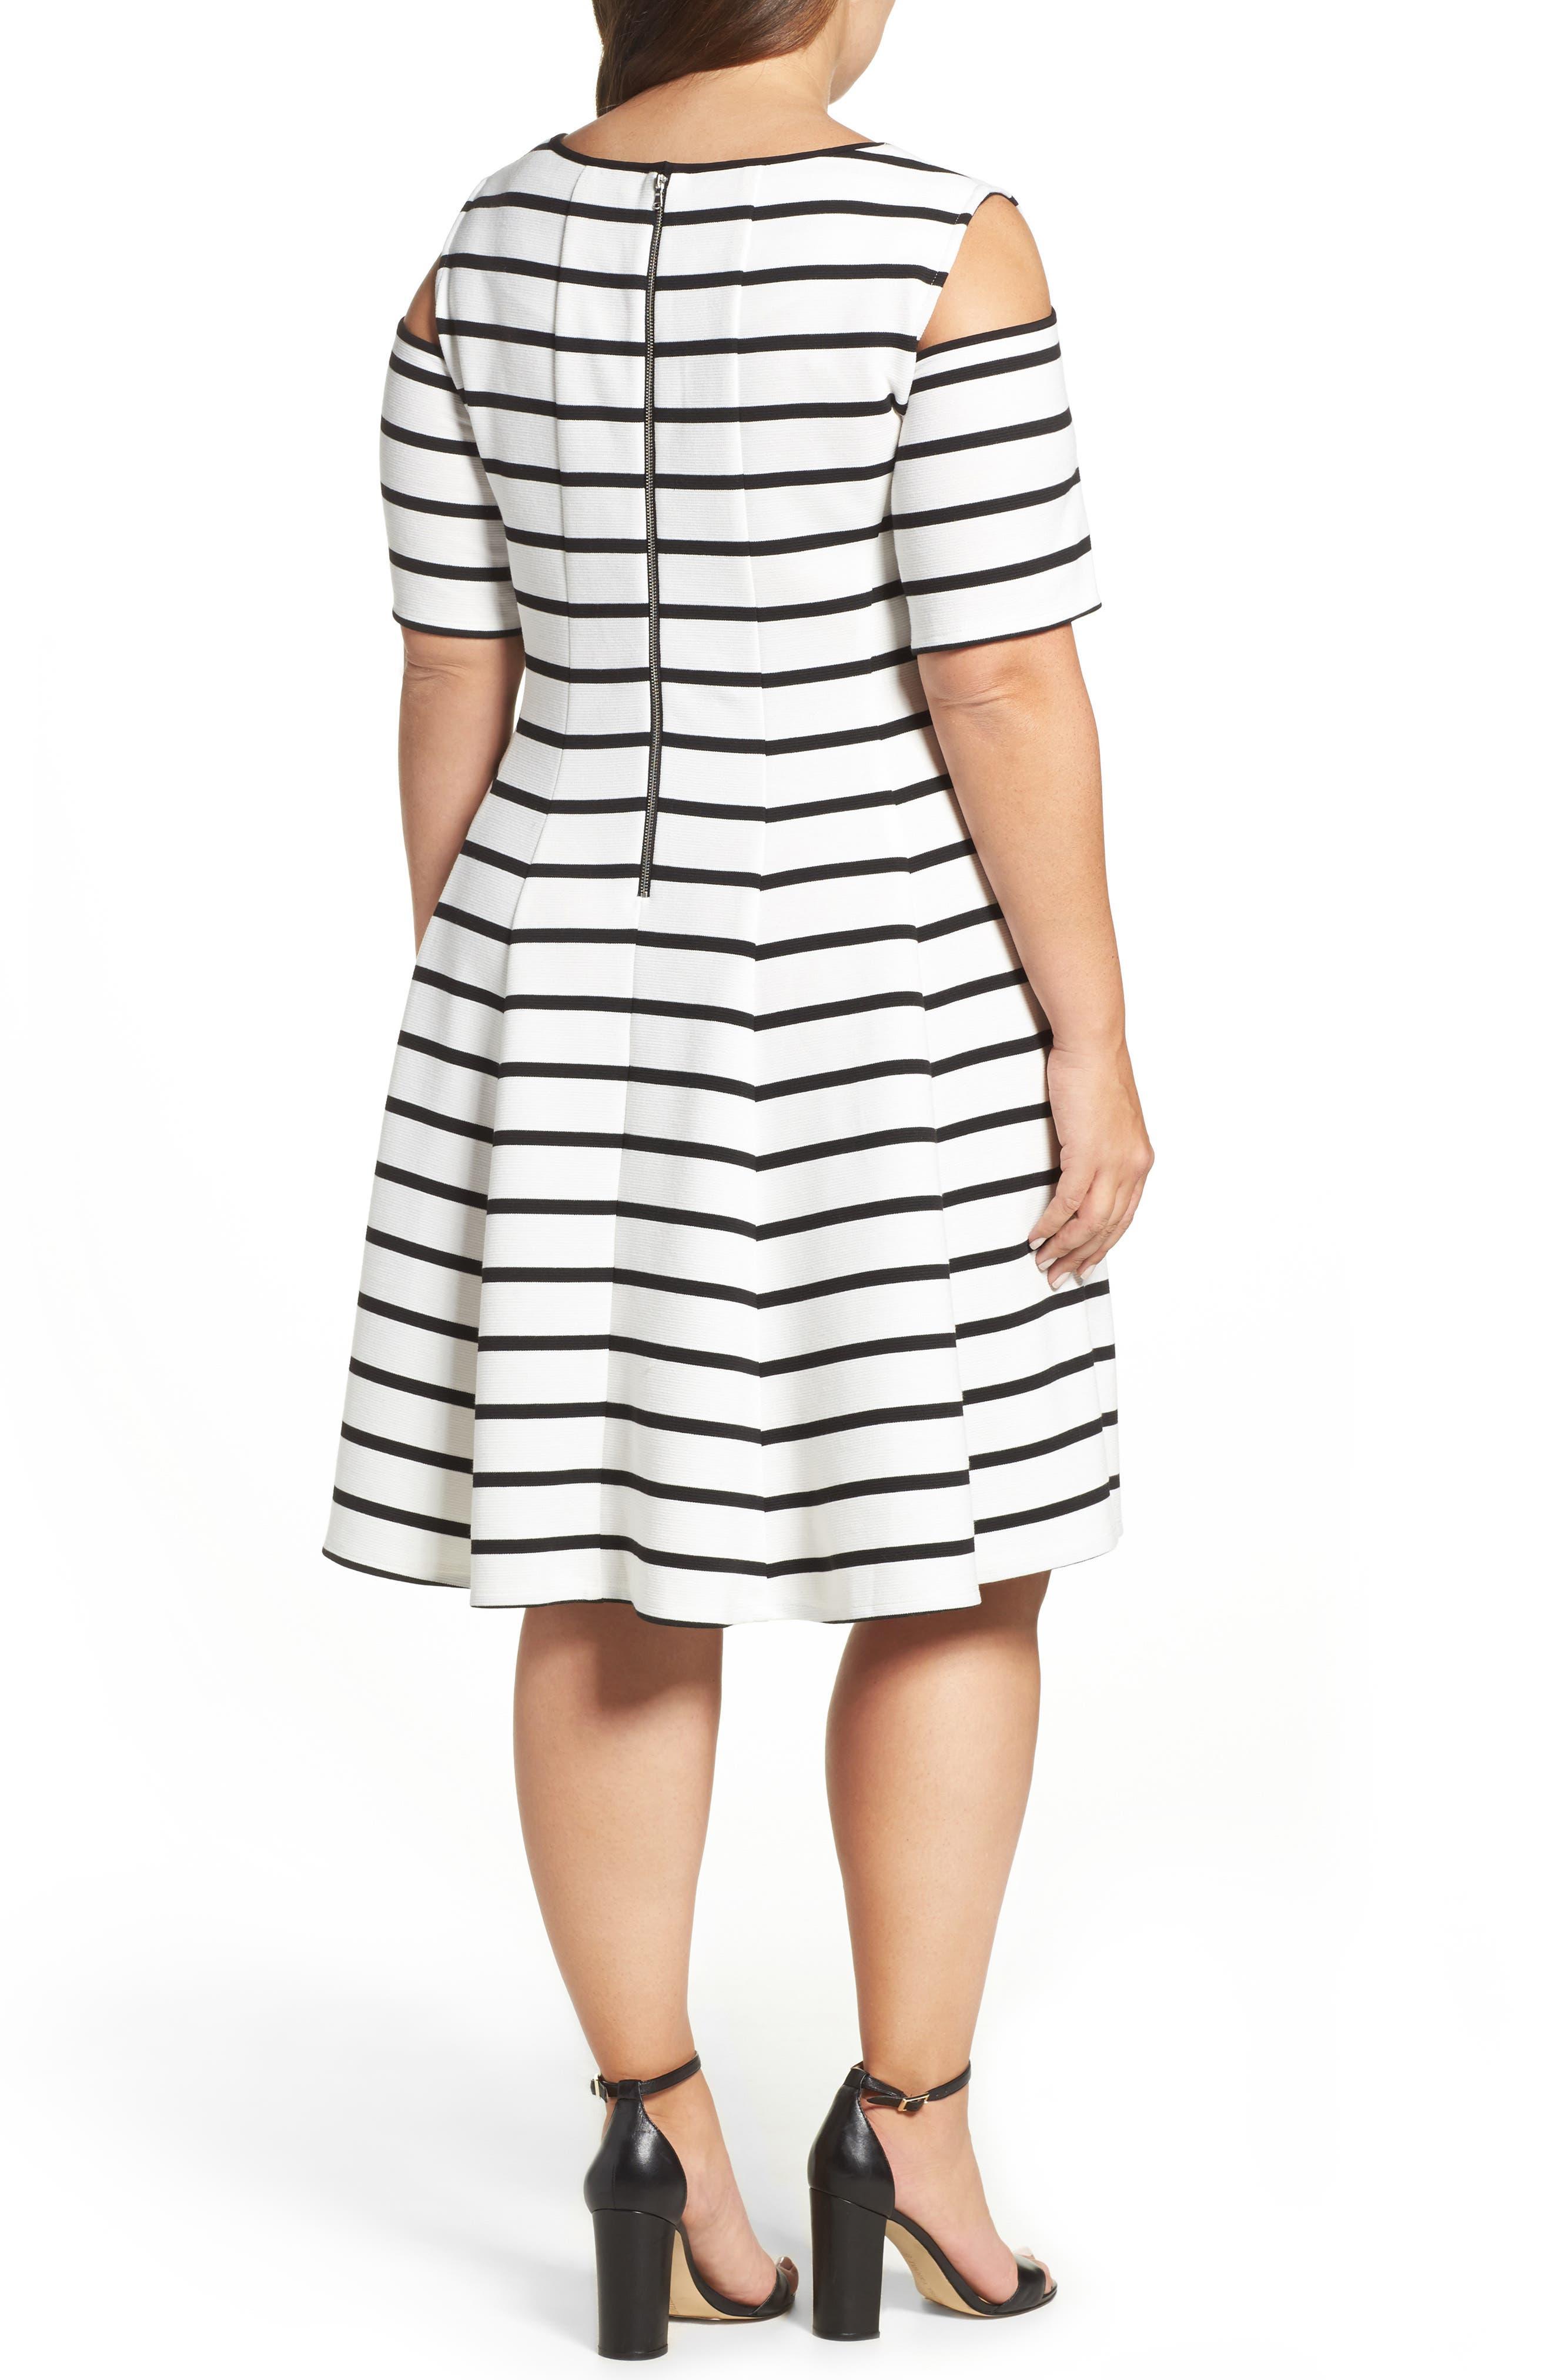 Alternate Image 2  - Gabby Skye Cold Shoulder Fit & Flare Dress (Plus Size)